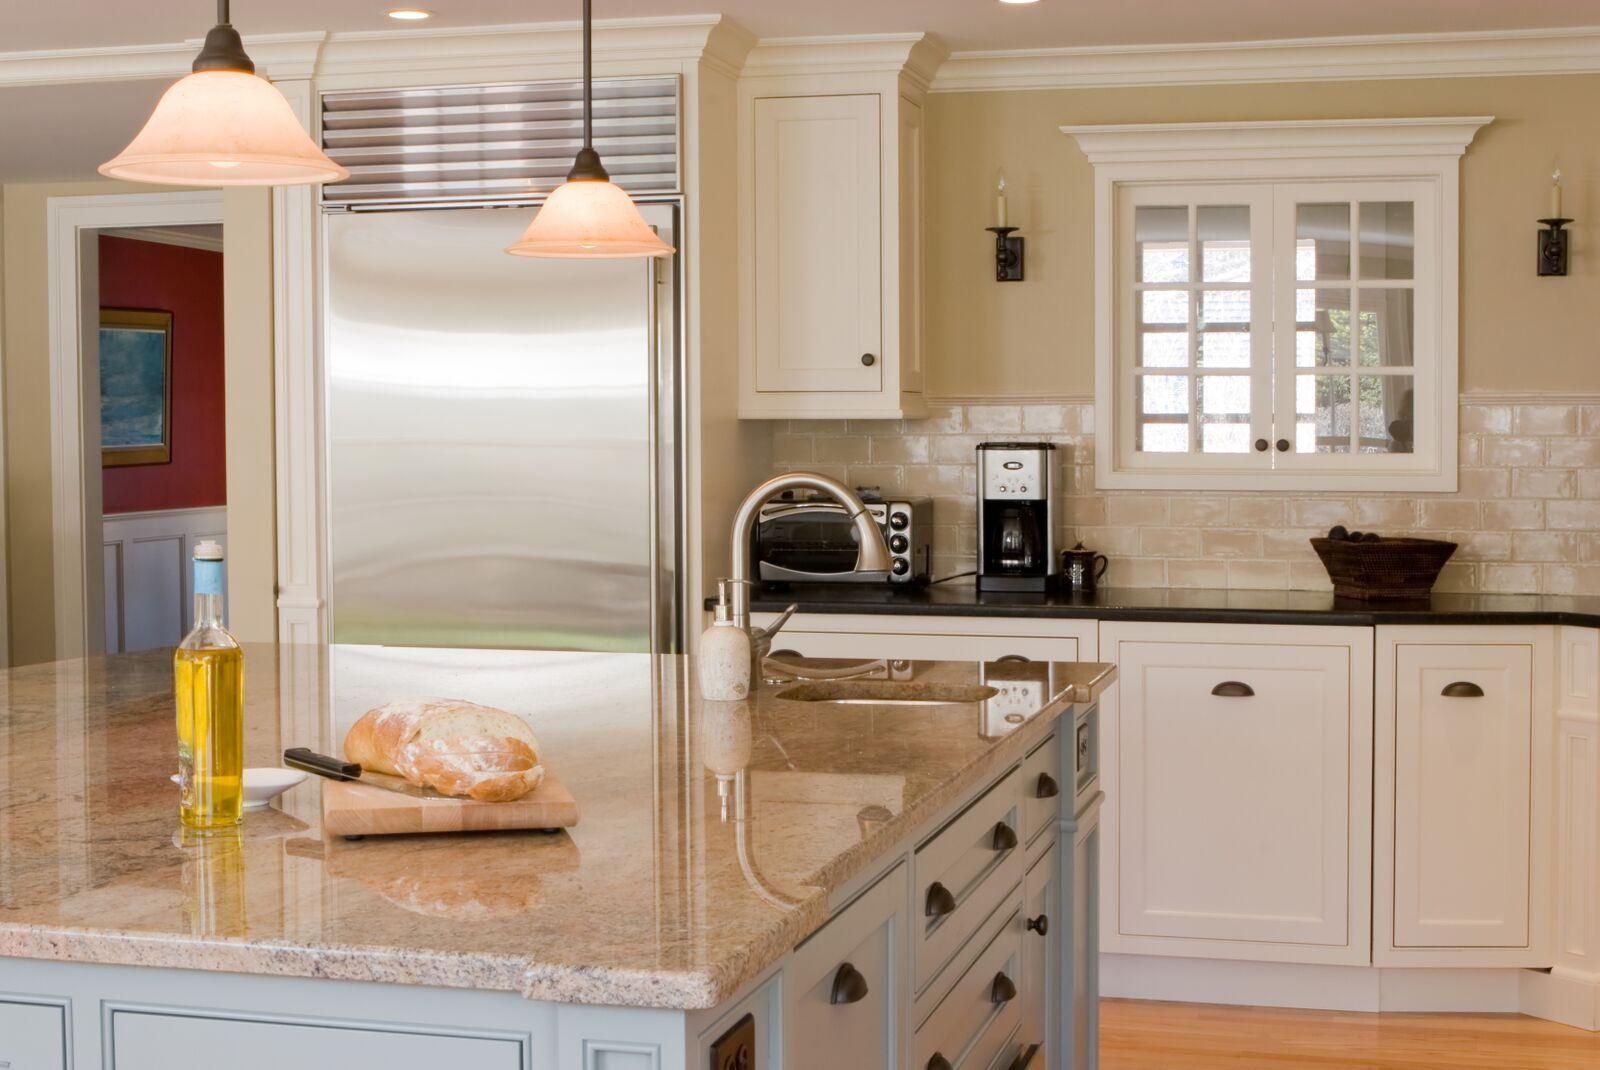 20 Bainbrook Brown Granite Countertop Kitchen Design And Layout Ideas Check More A Cheap Granite Countertops Granite Countertops Granite Countertops Kitchen